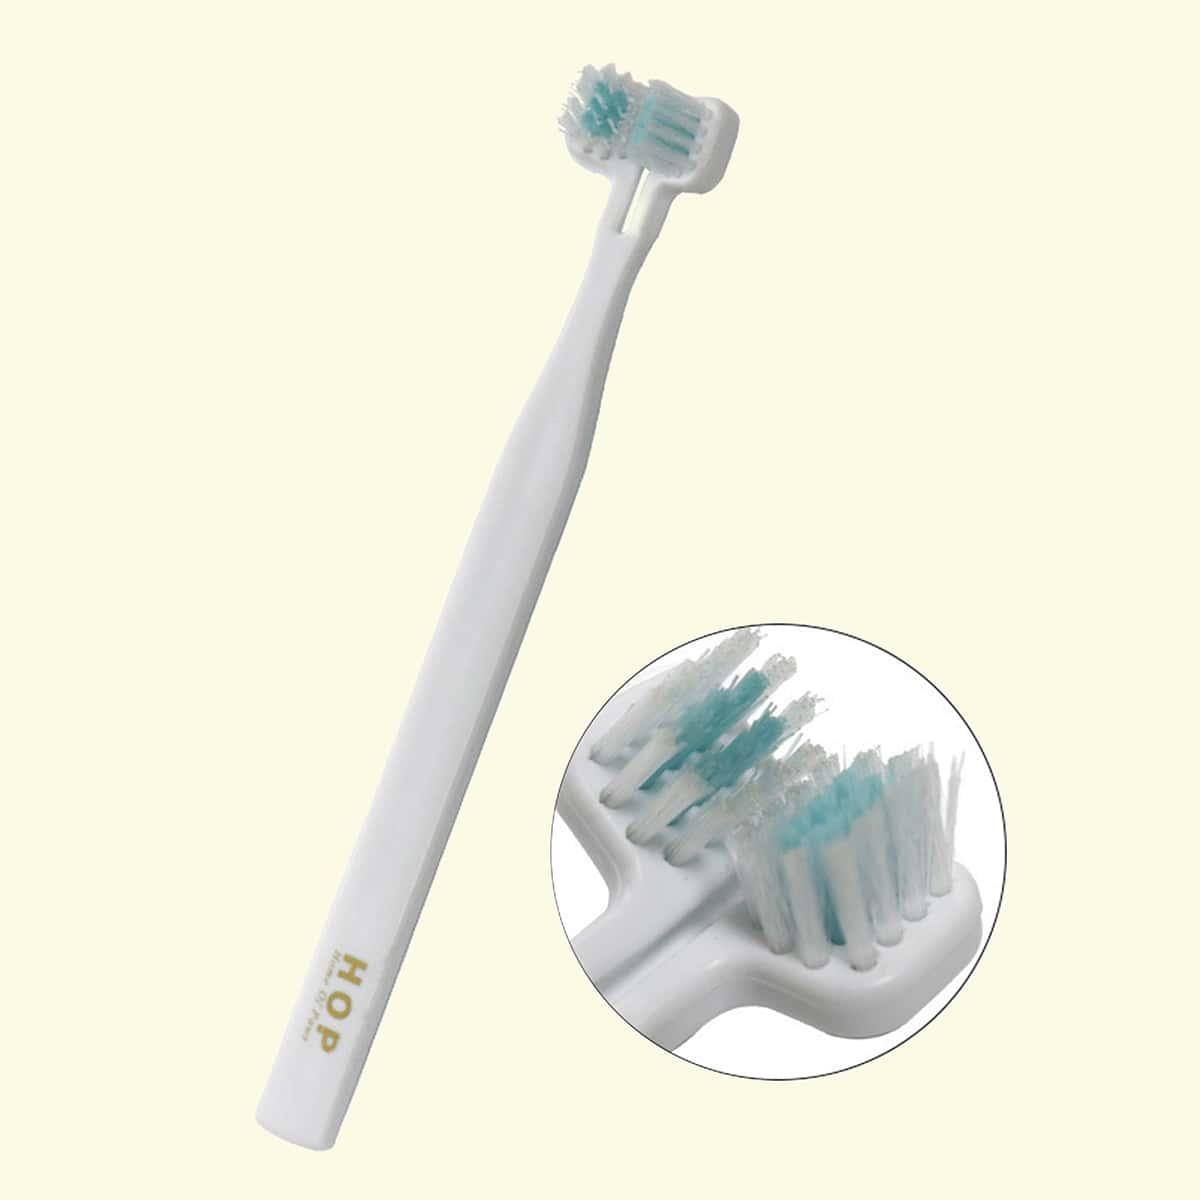 1 Stück Katze Zahnbürste